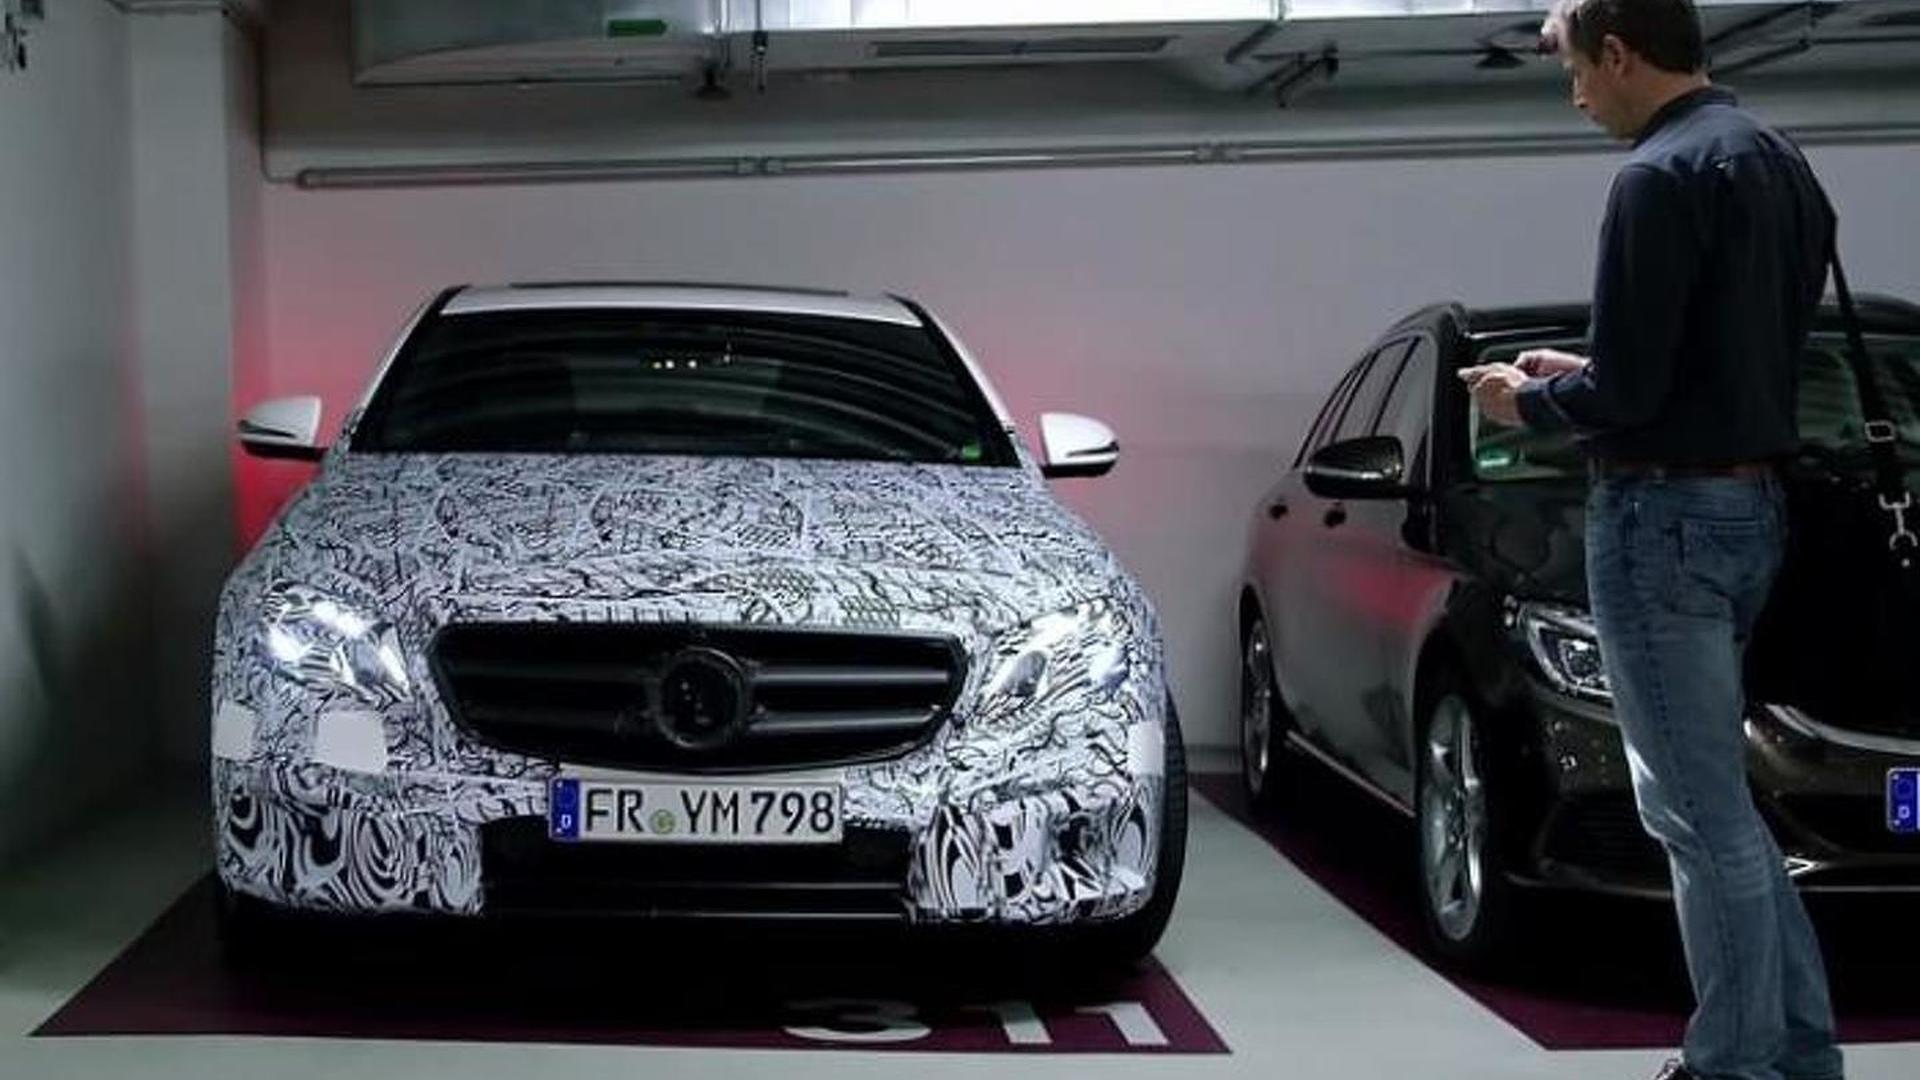 2017 mercedes e class remote parking pilot system for Mercedes benz parking